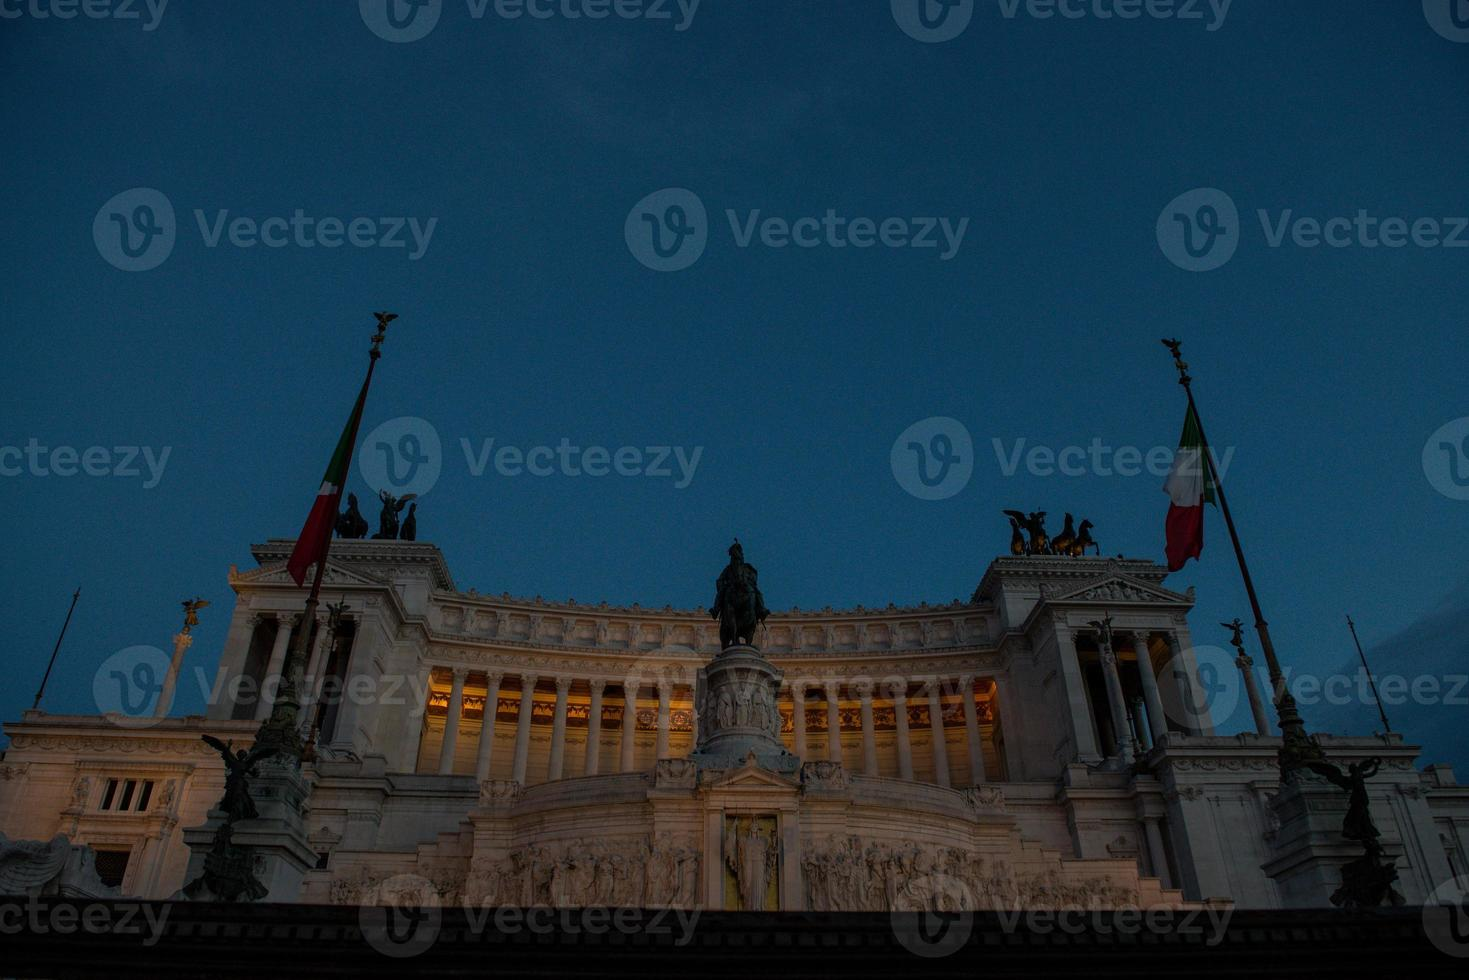 El altare della patria. foto